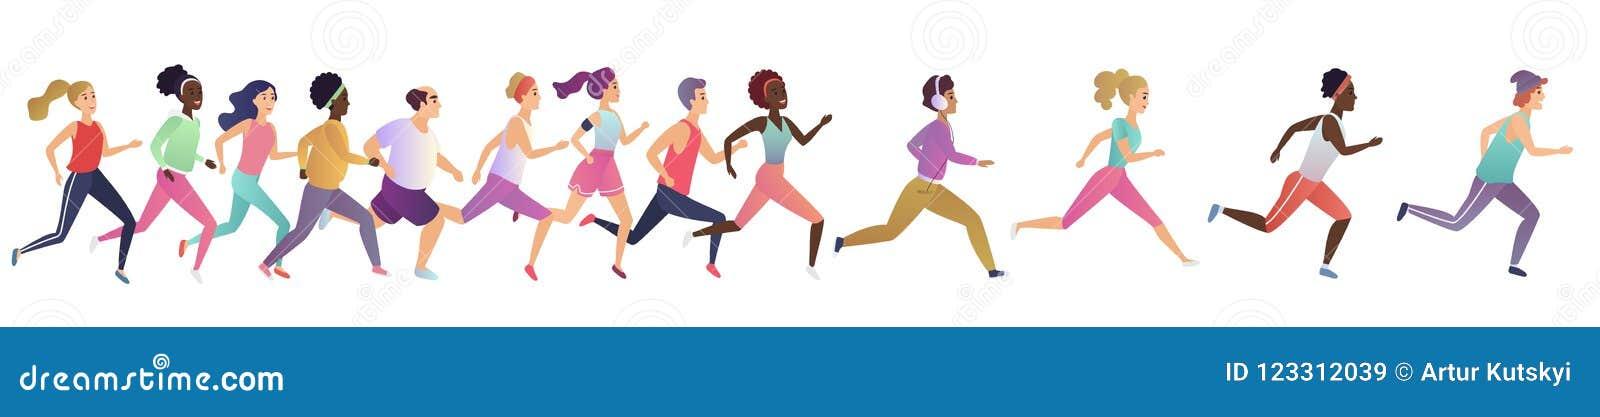 Jogging running people. Sport running group concept. People athlete maraphon runner race, various people runners.